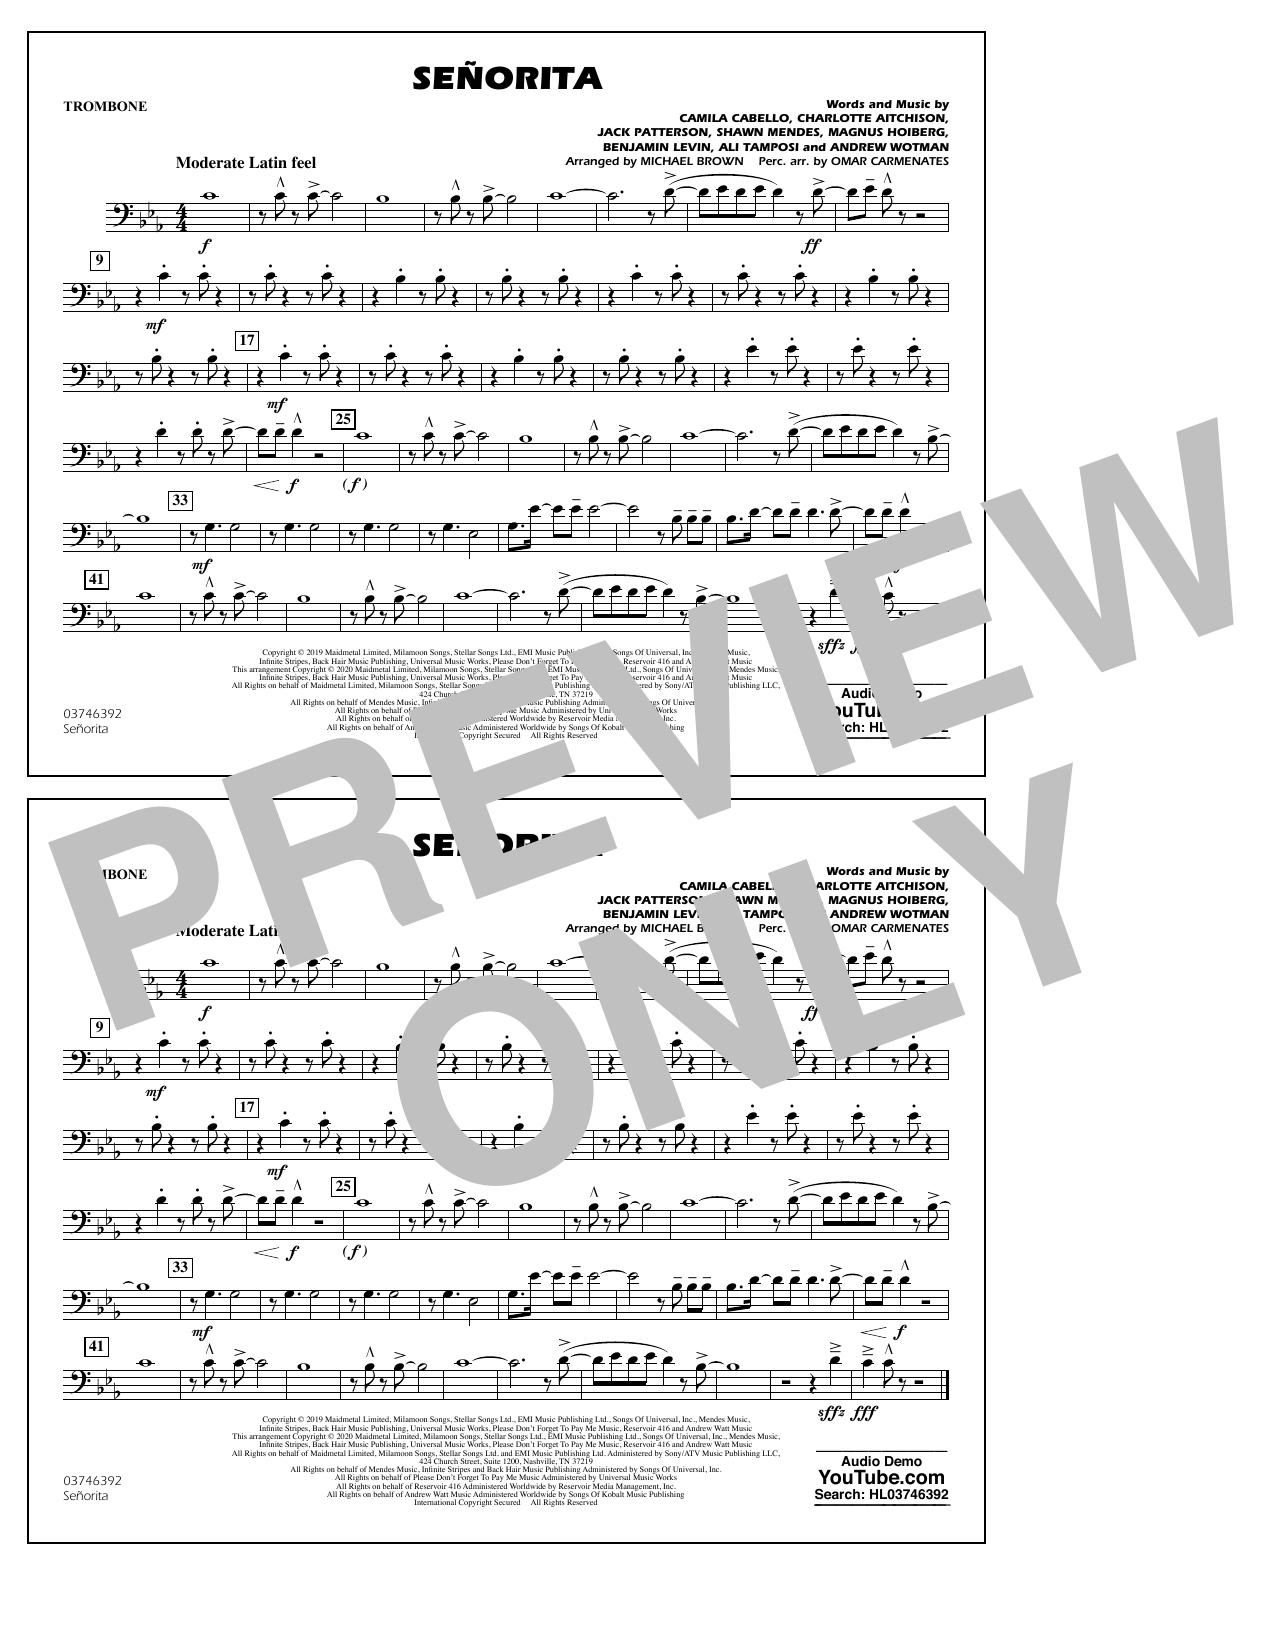 Señorita (arr. Carmenates and Brown) - Trombone Sheet Music